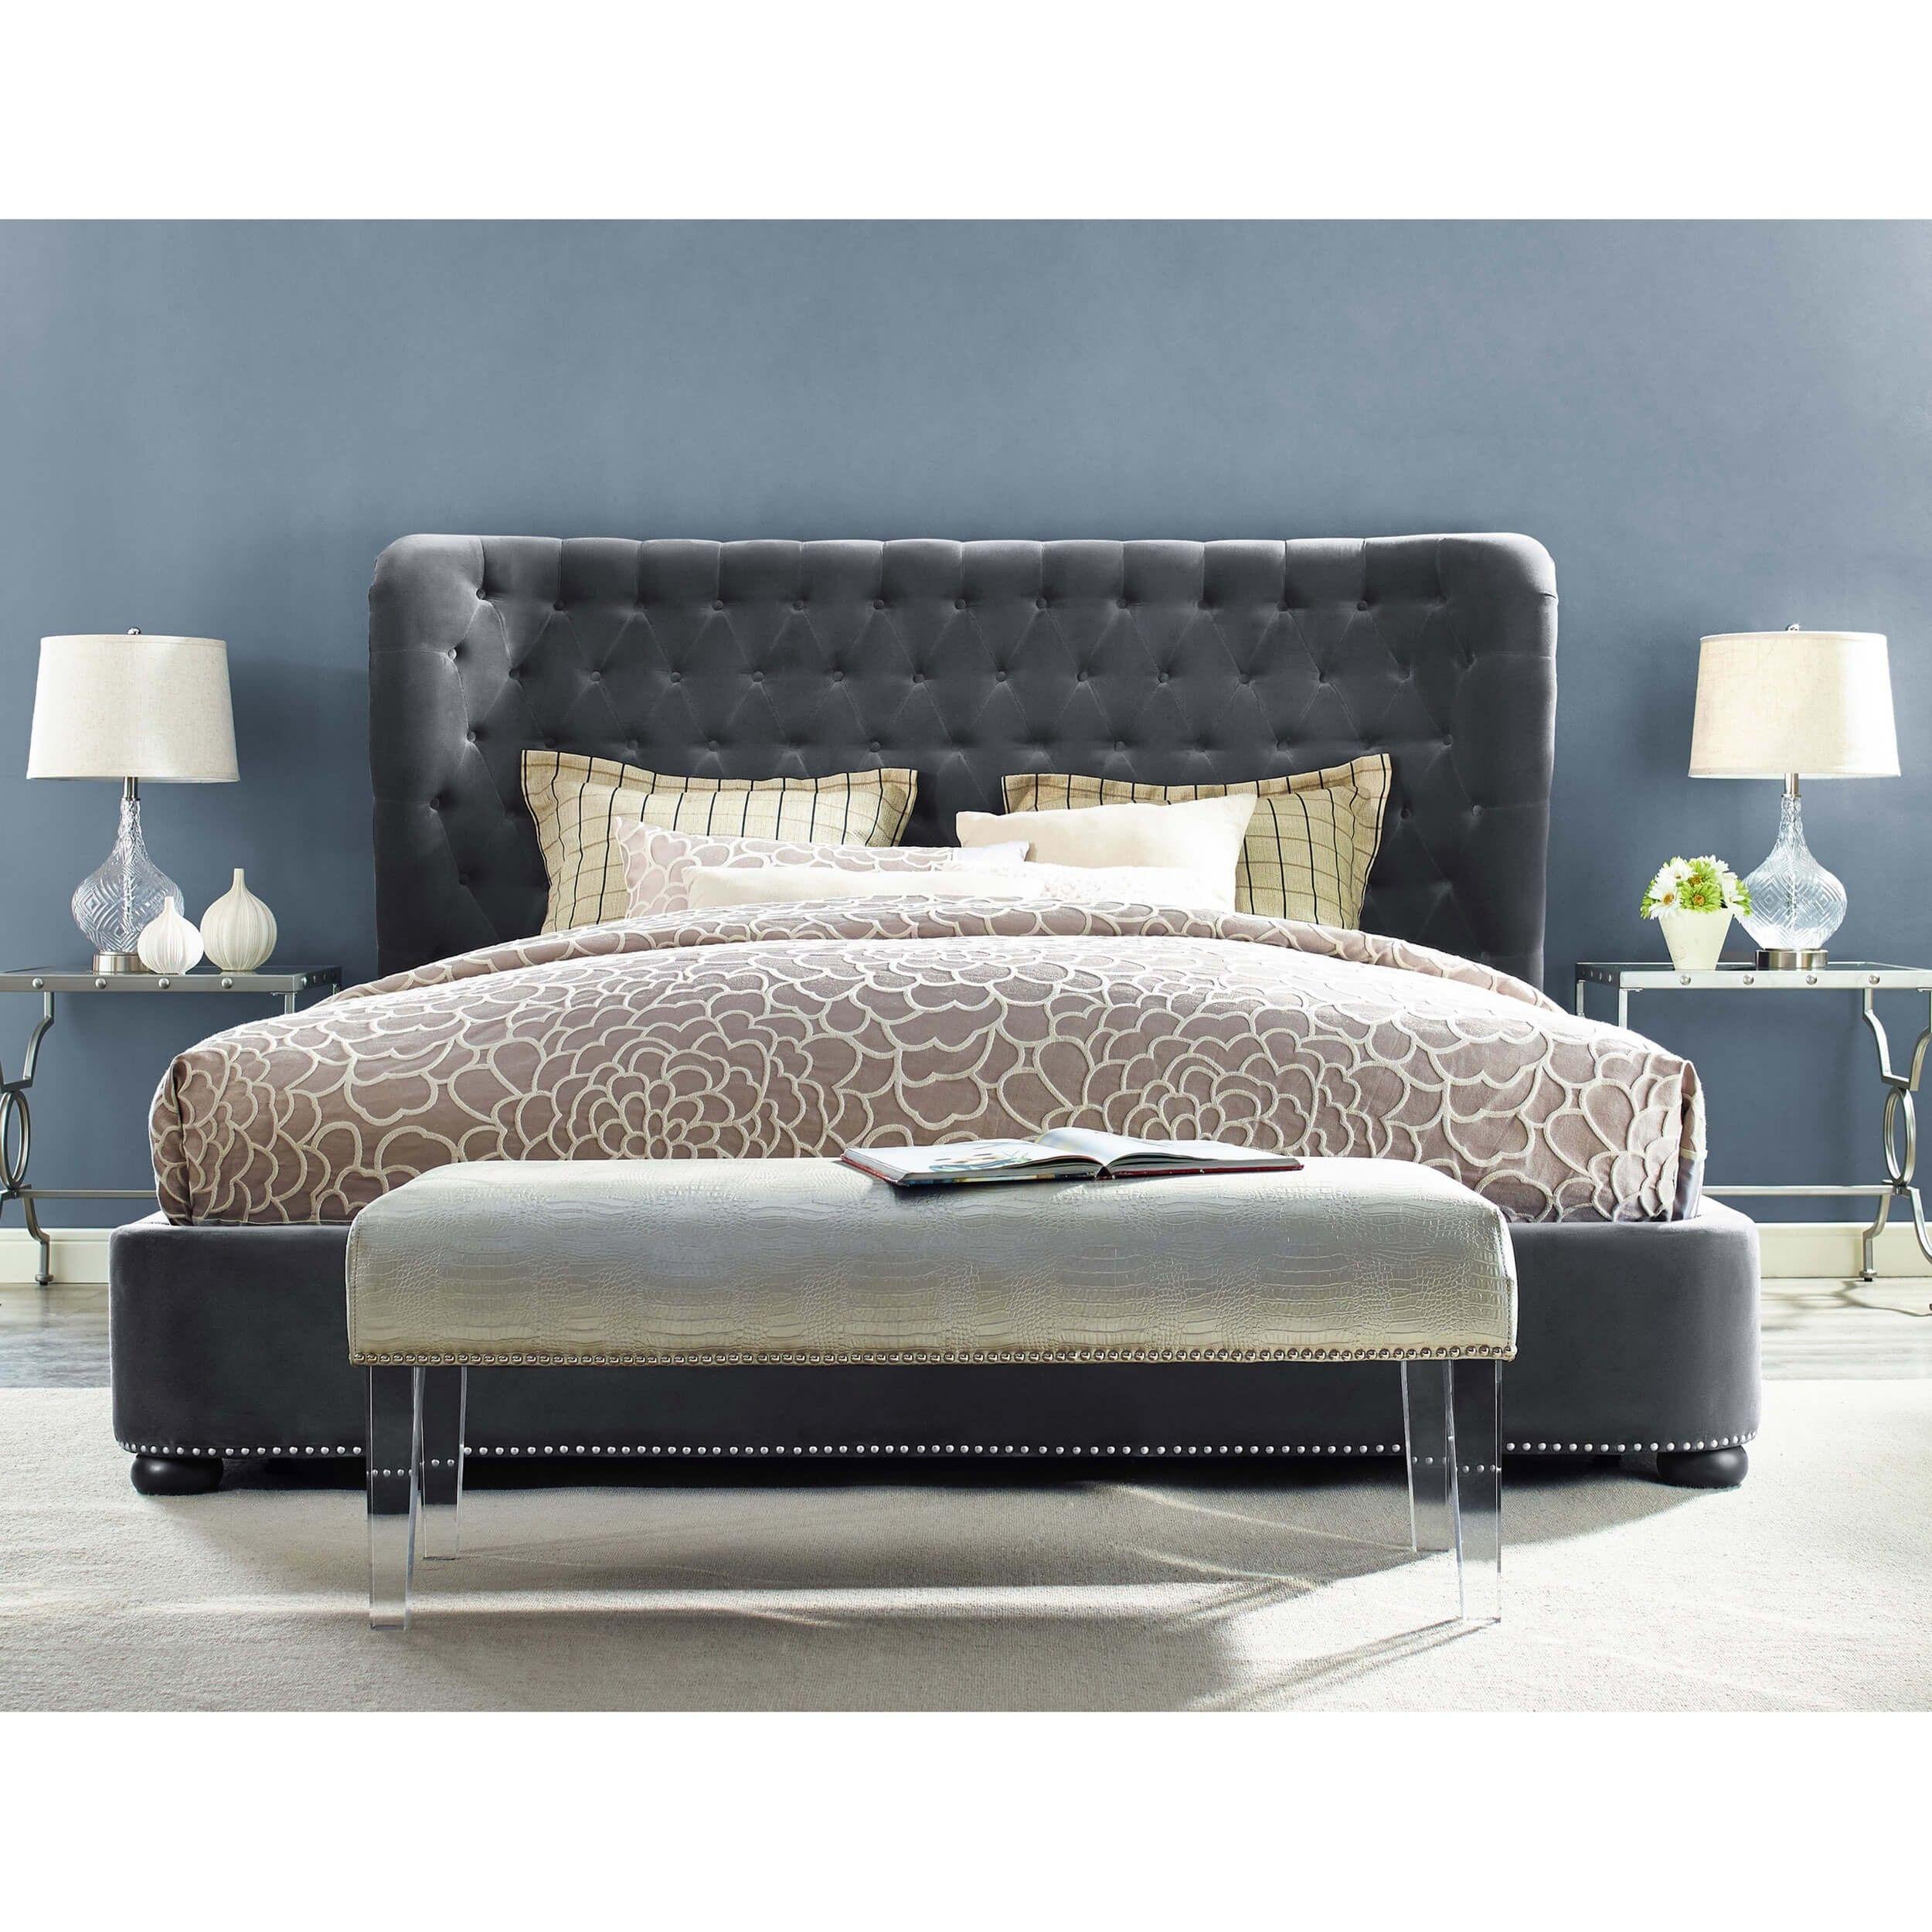 Finley Bed Grey Velvet Queen Grey Bed Frame Upholstered